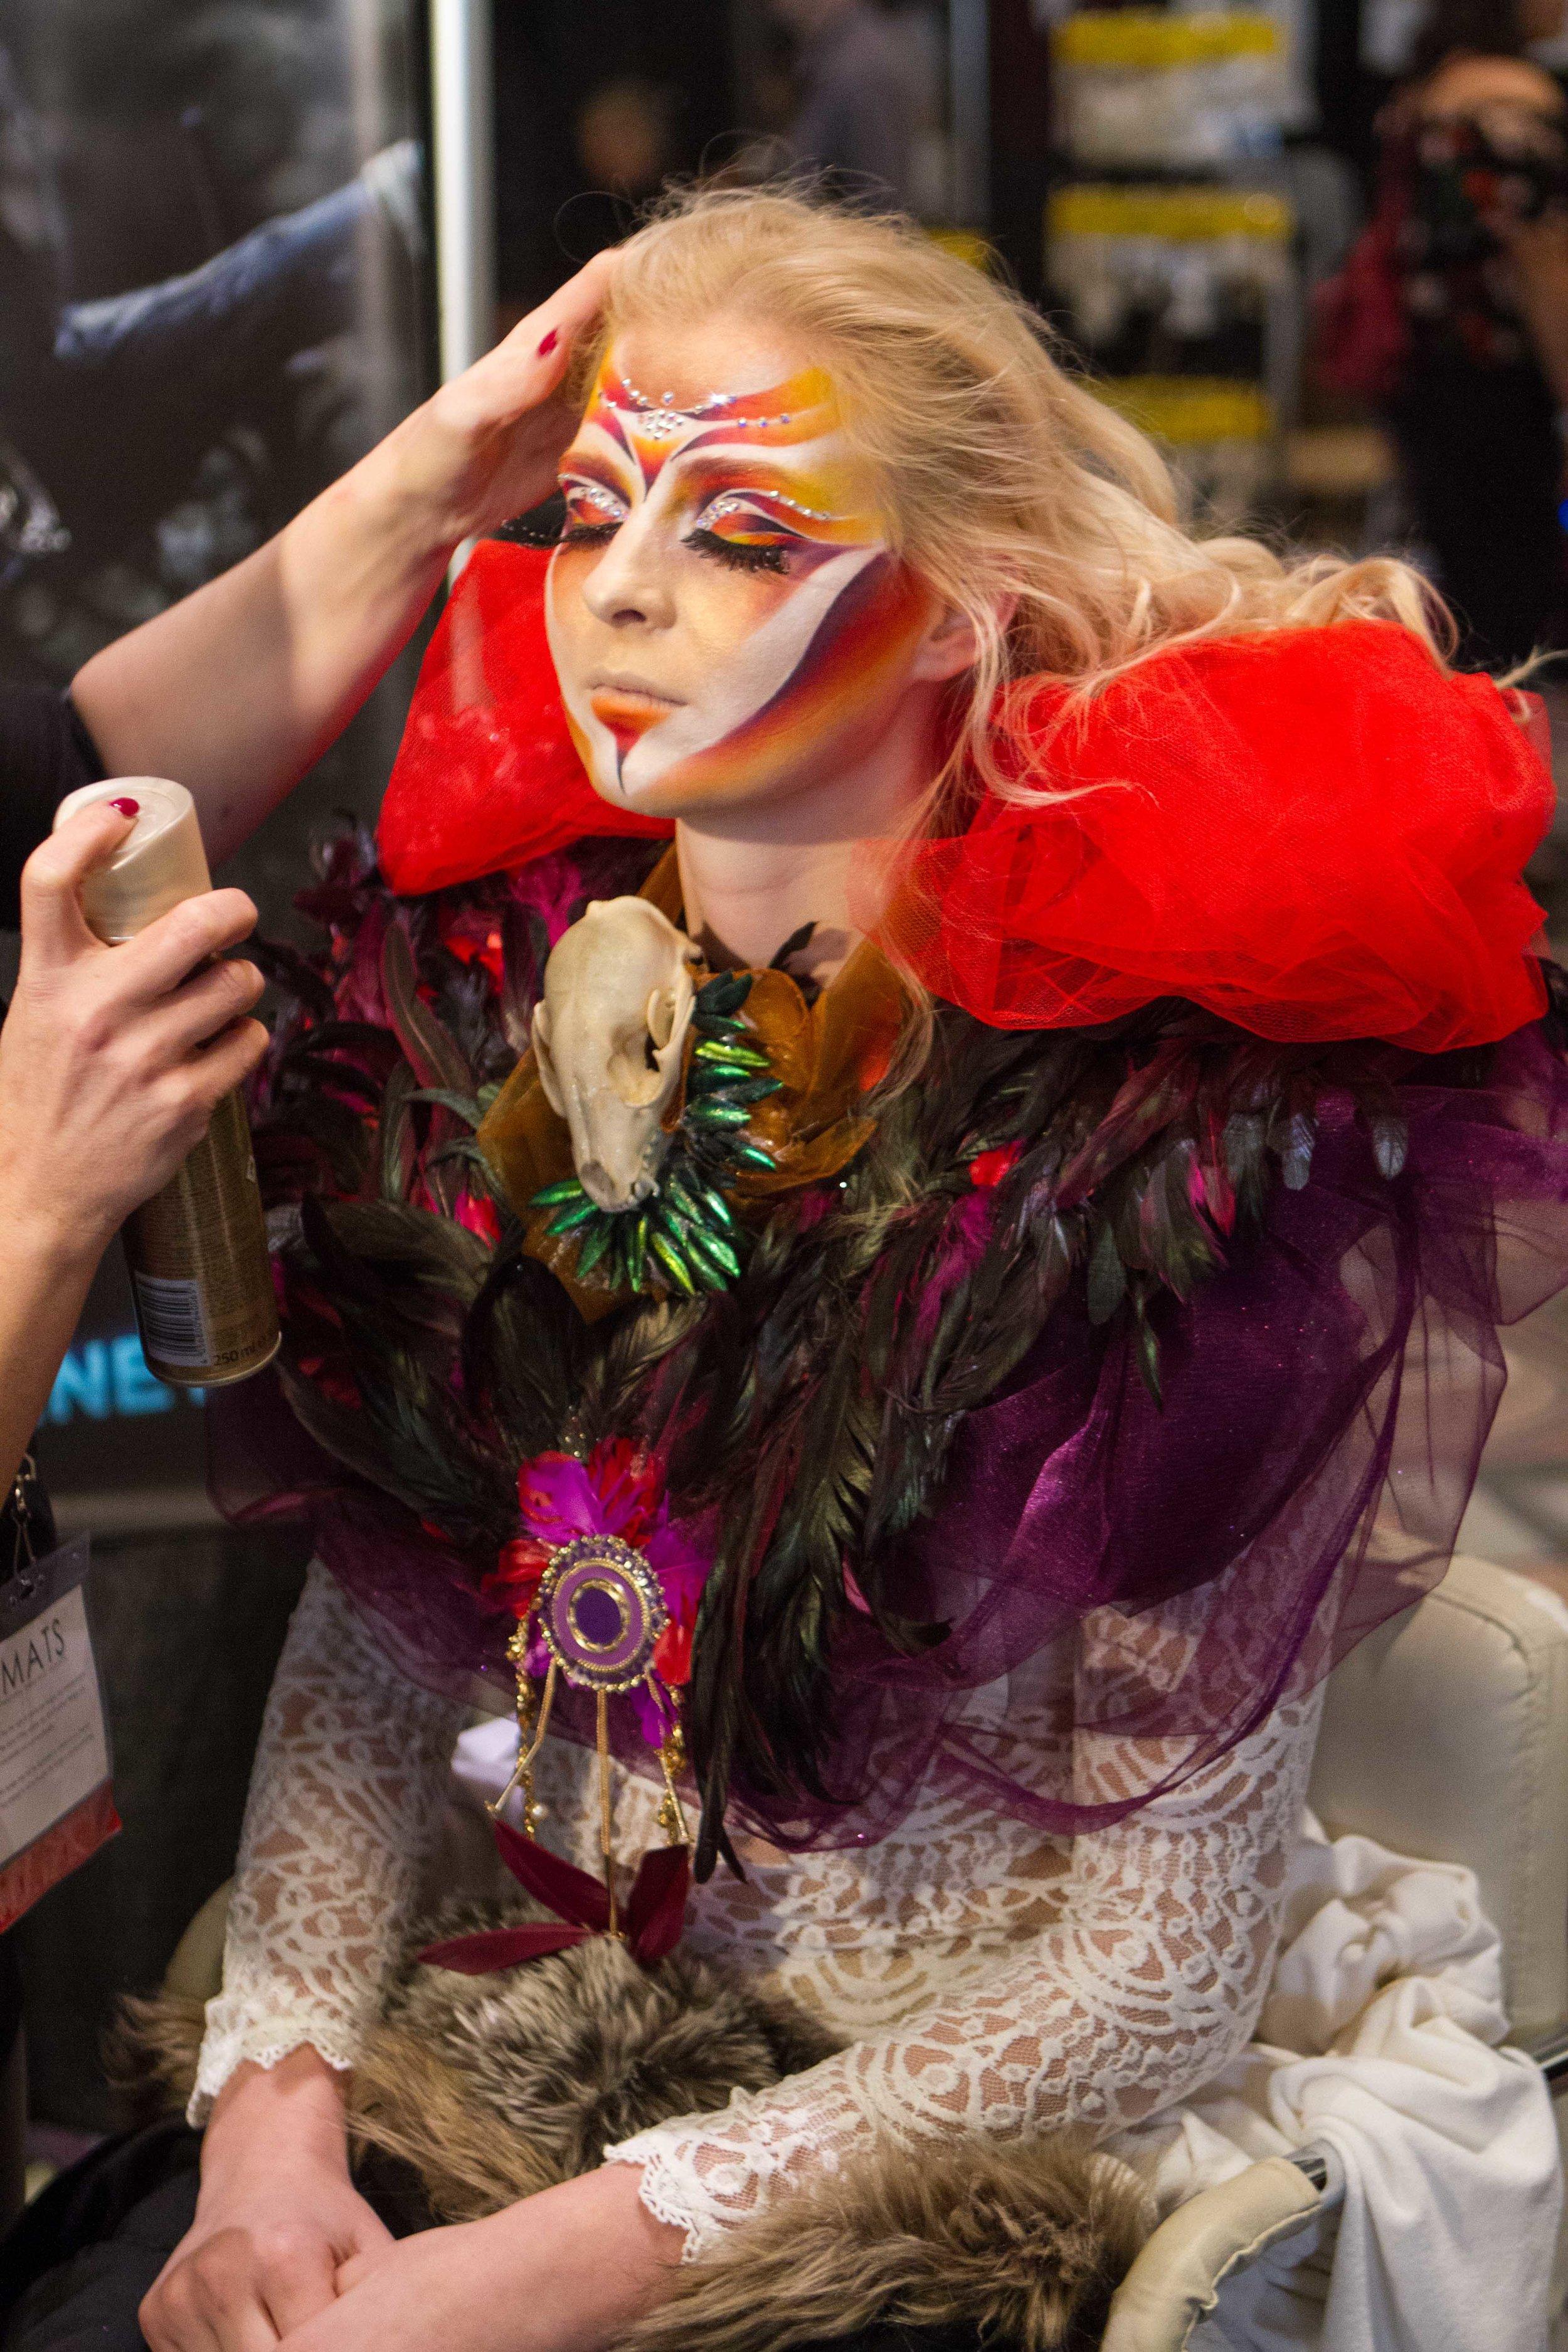 IMATS 2017 - Kristina Asztalos Beauty SFX (www.KyleReaArt.com - www.KyleReaPhotography.com) 9.jpg